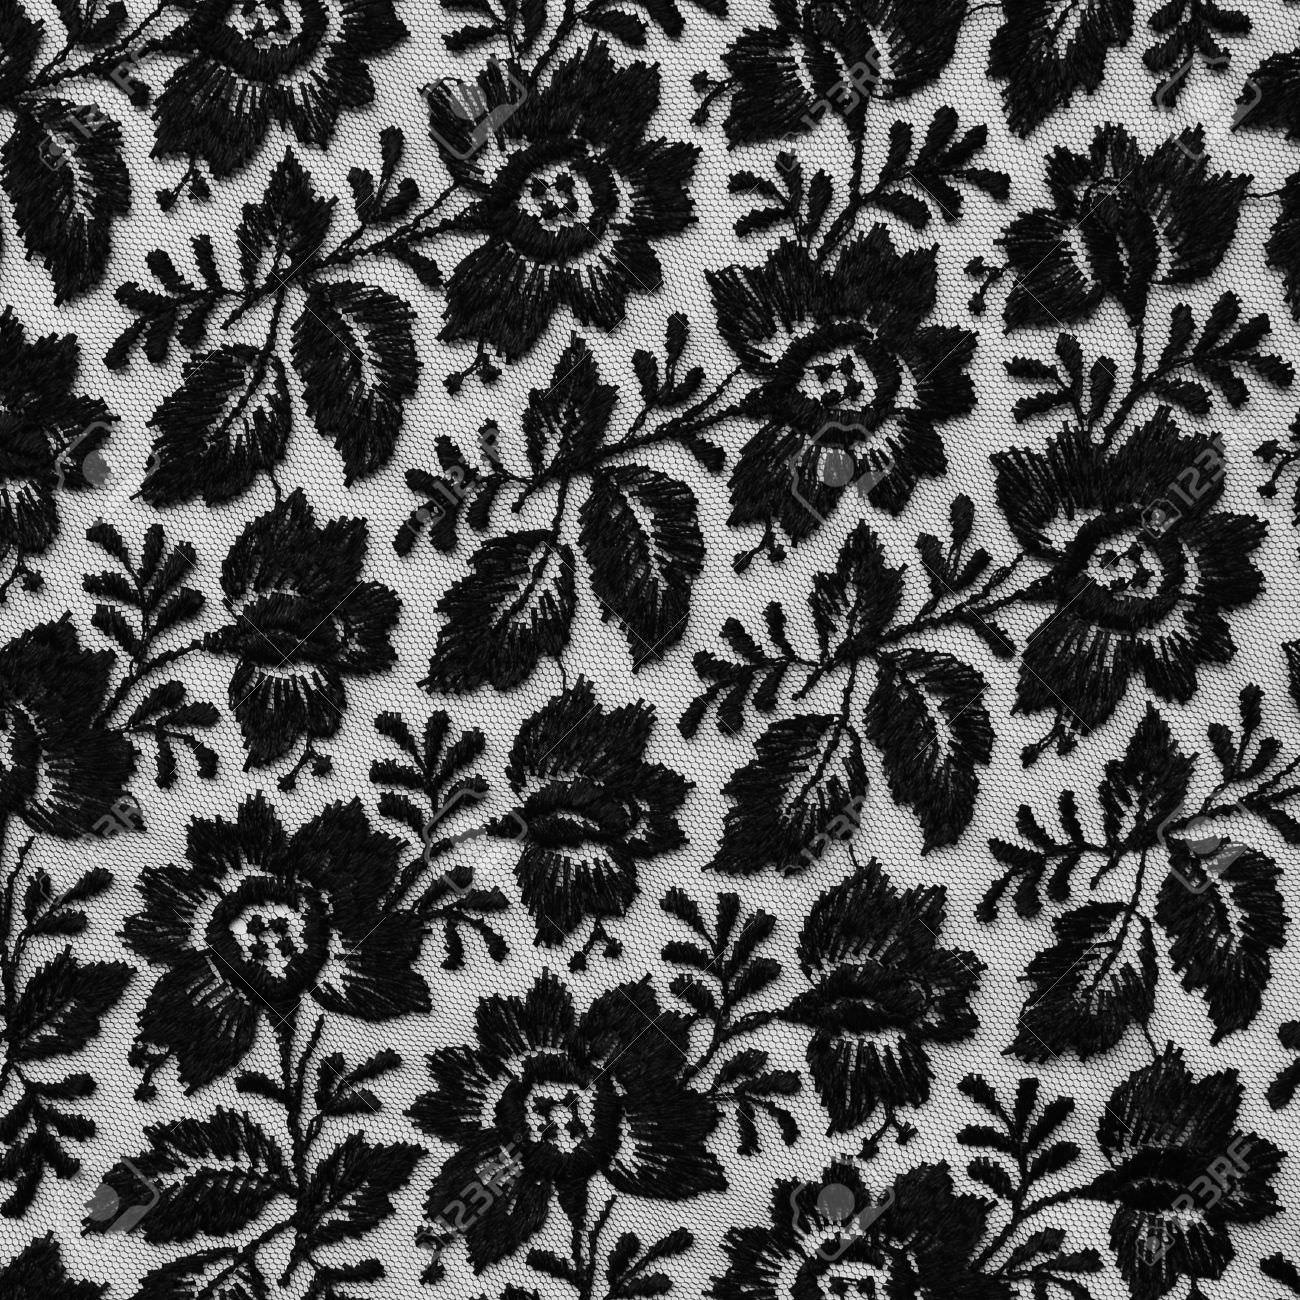 Victorian Wallpaper Black 28 Lace Texture Designs Patterns Backgrounds Design